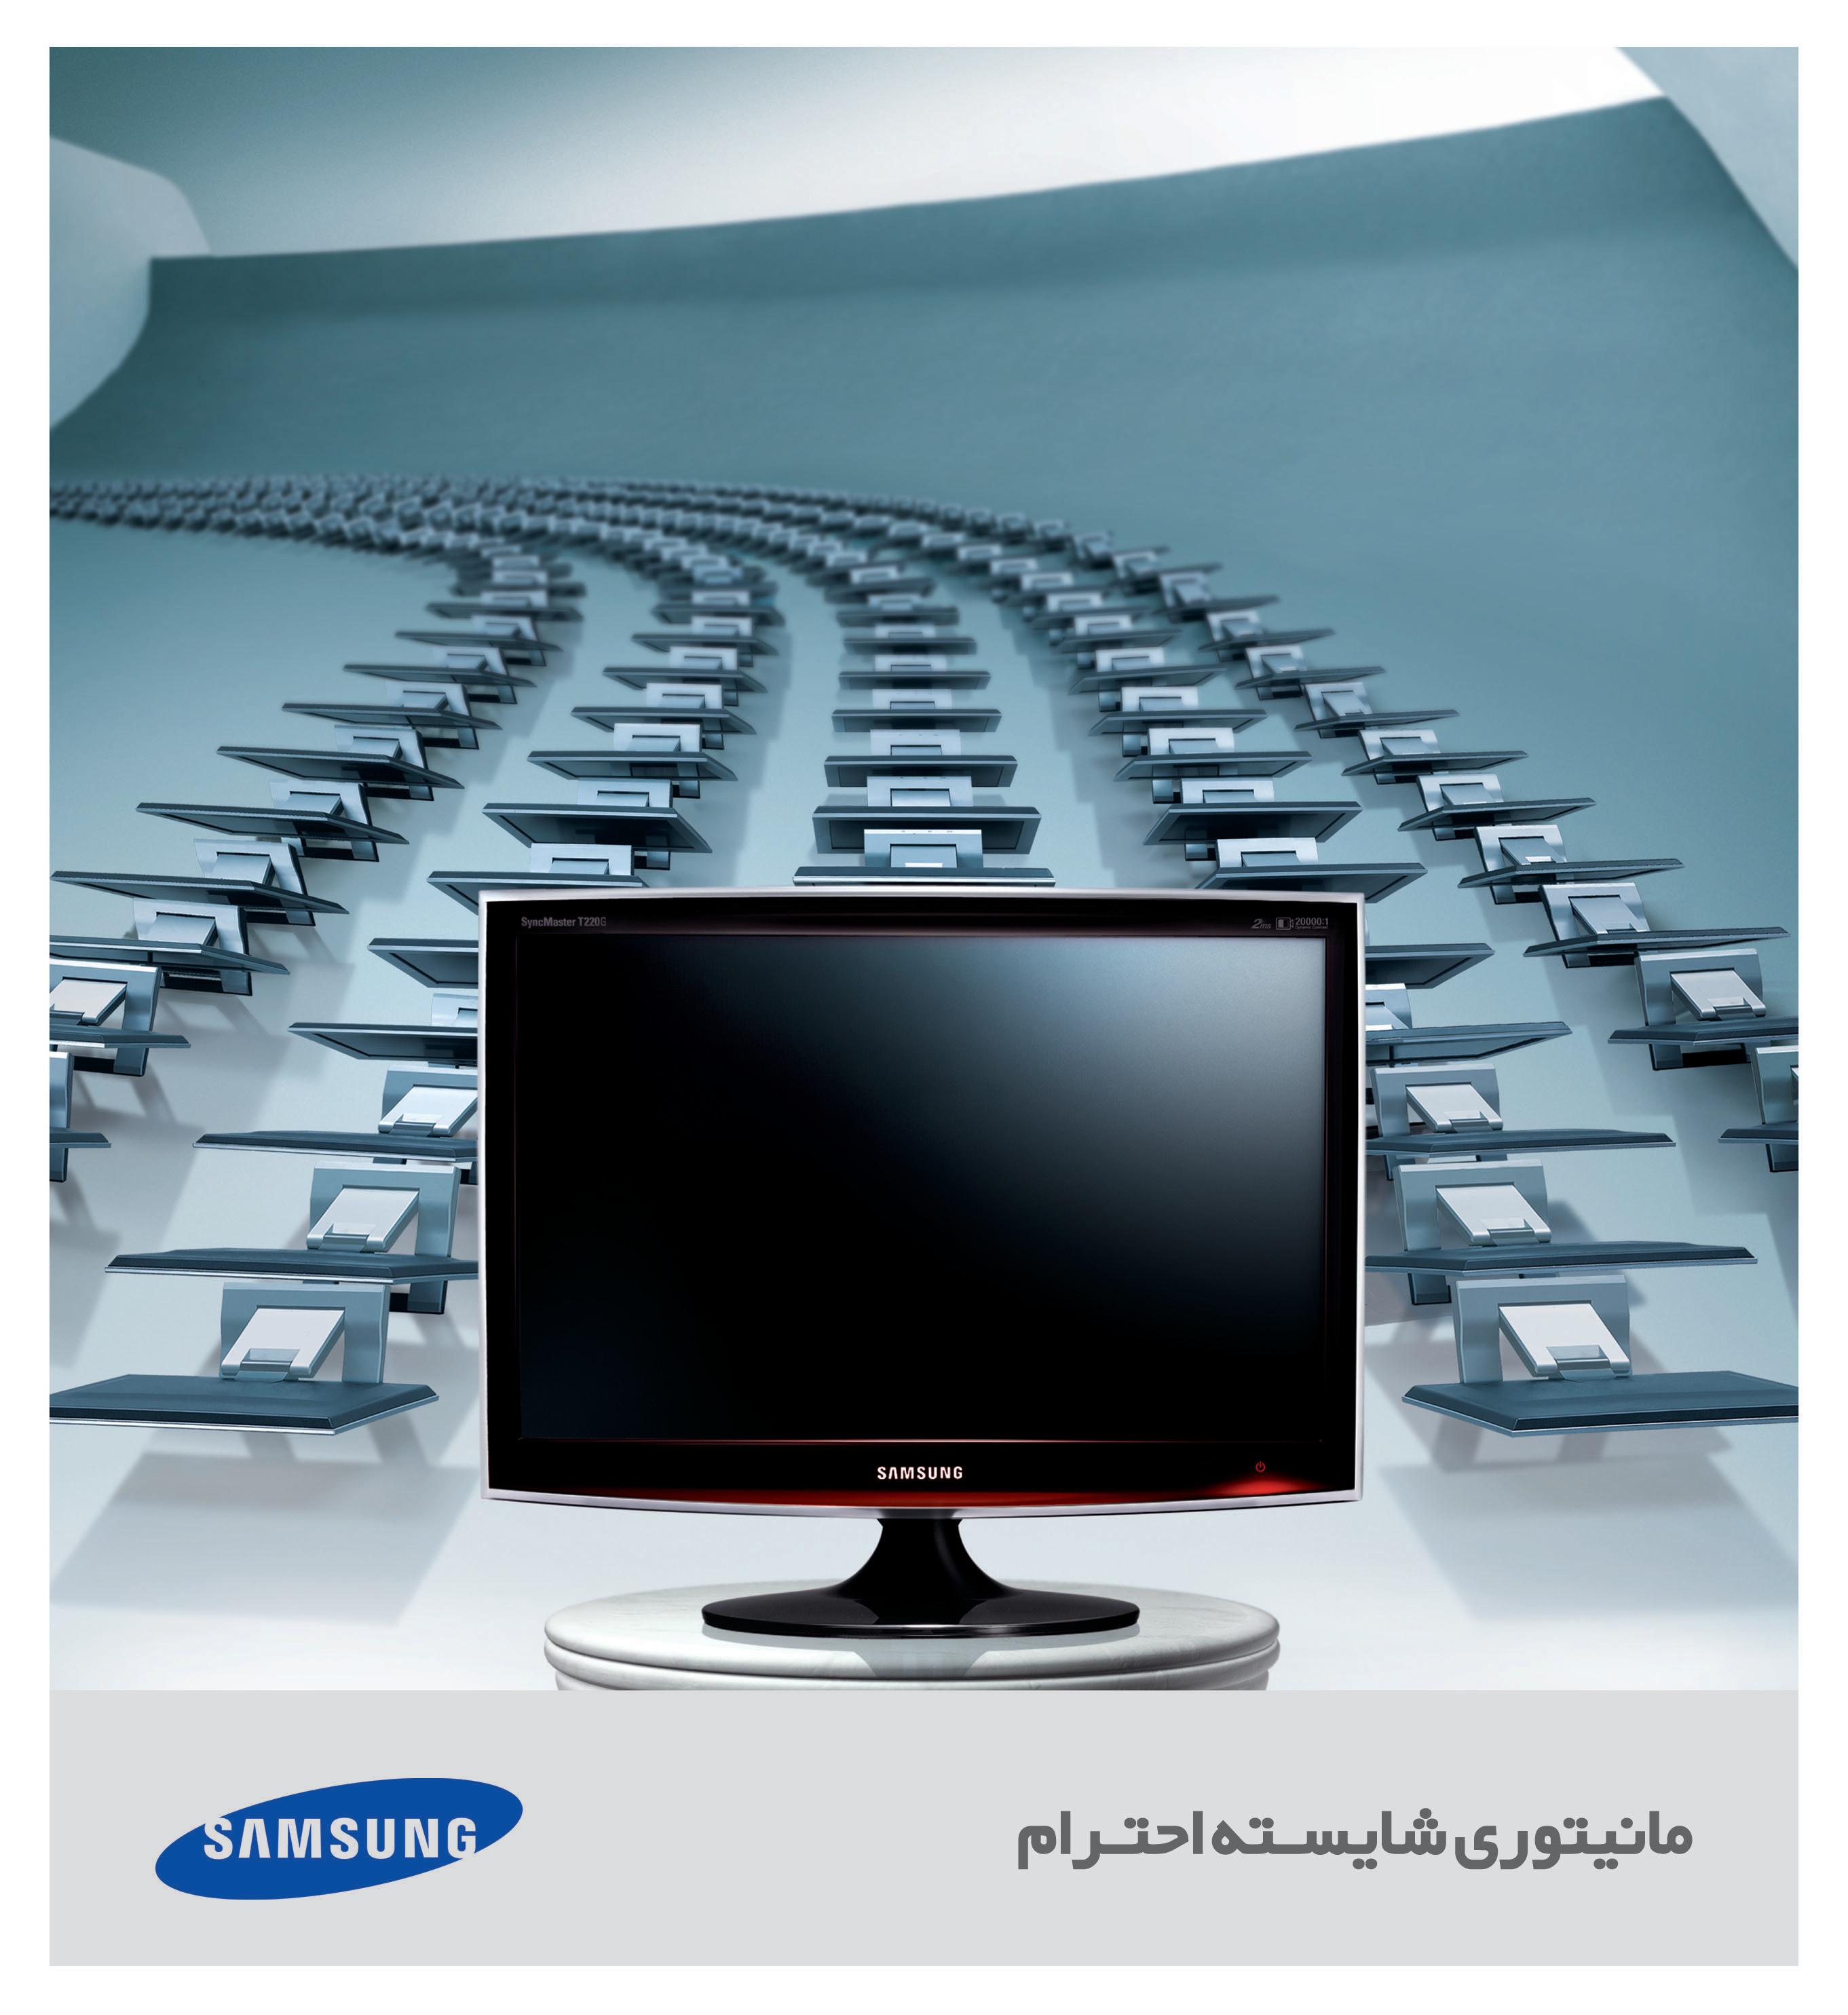 monitor Samsung (87.06.05)